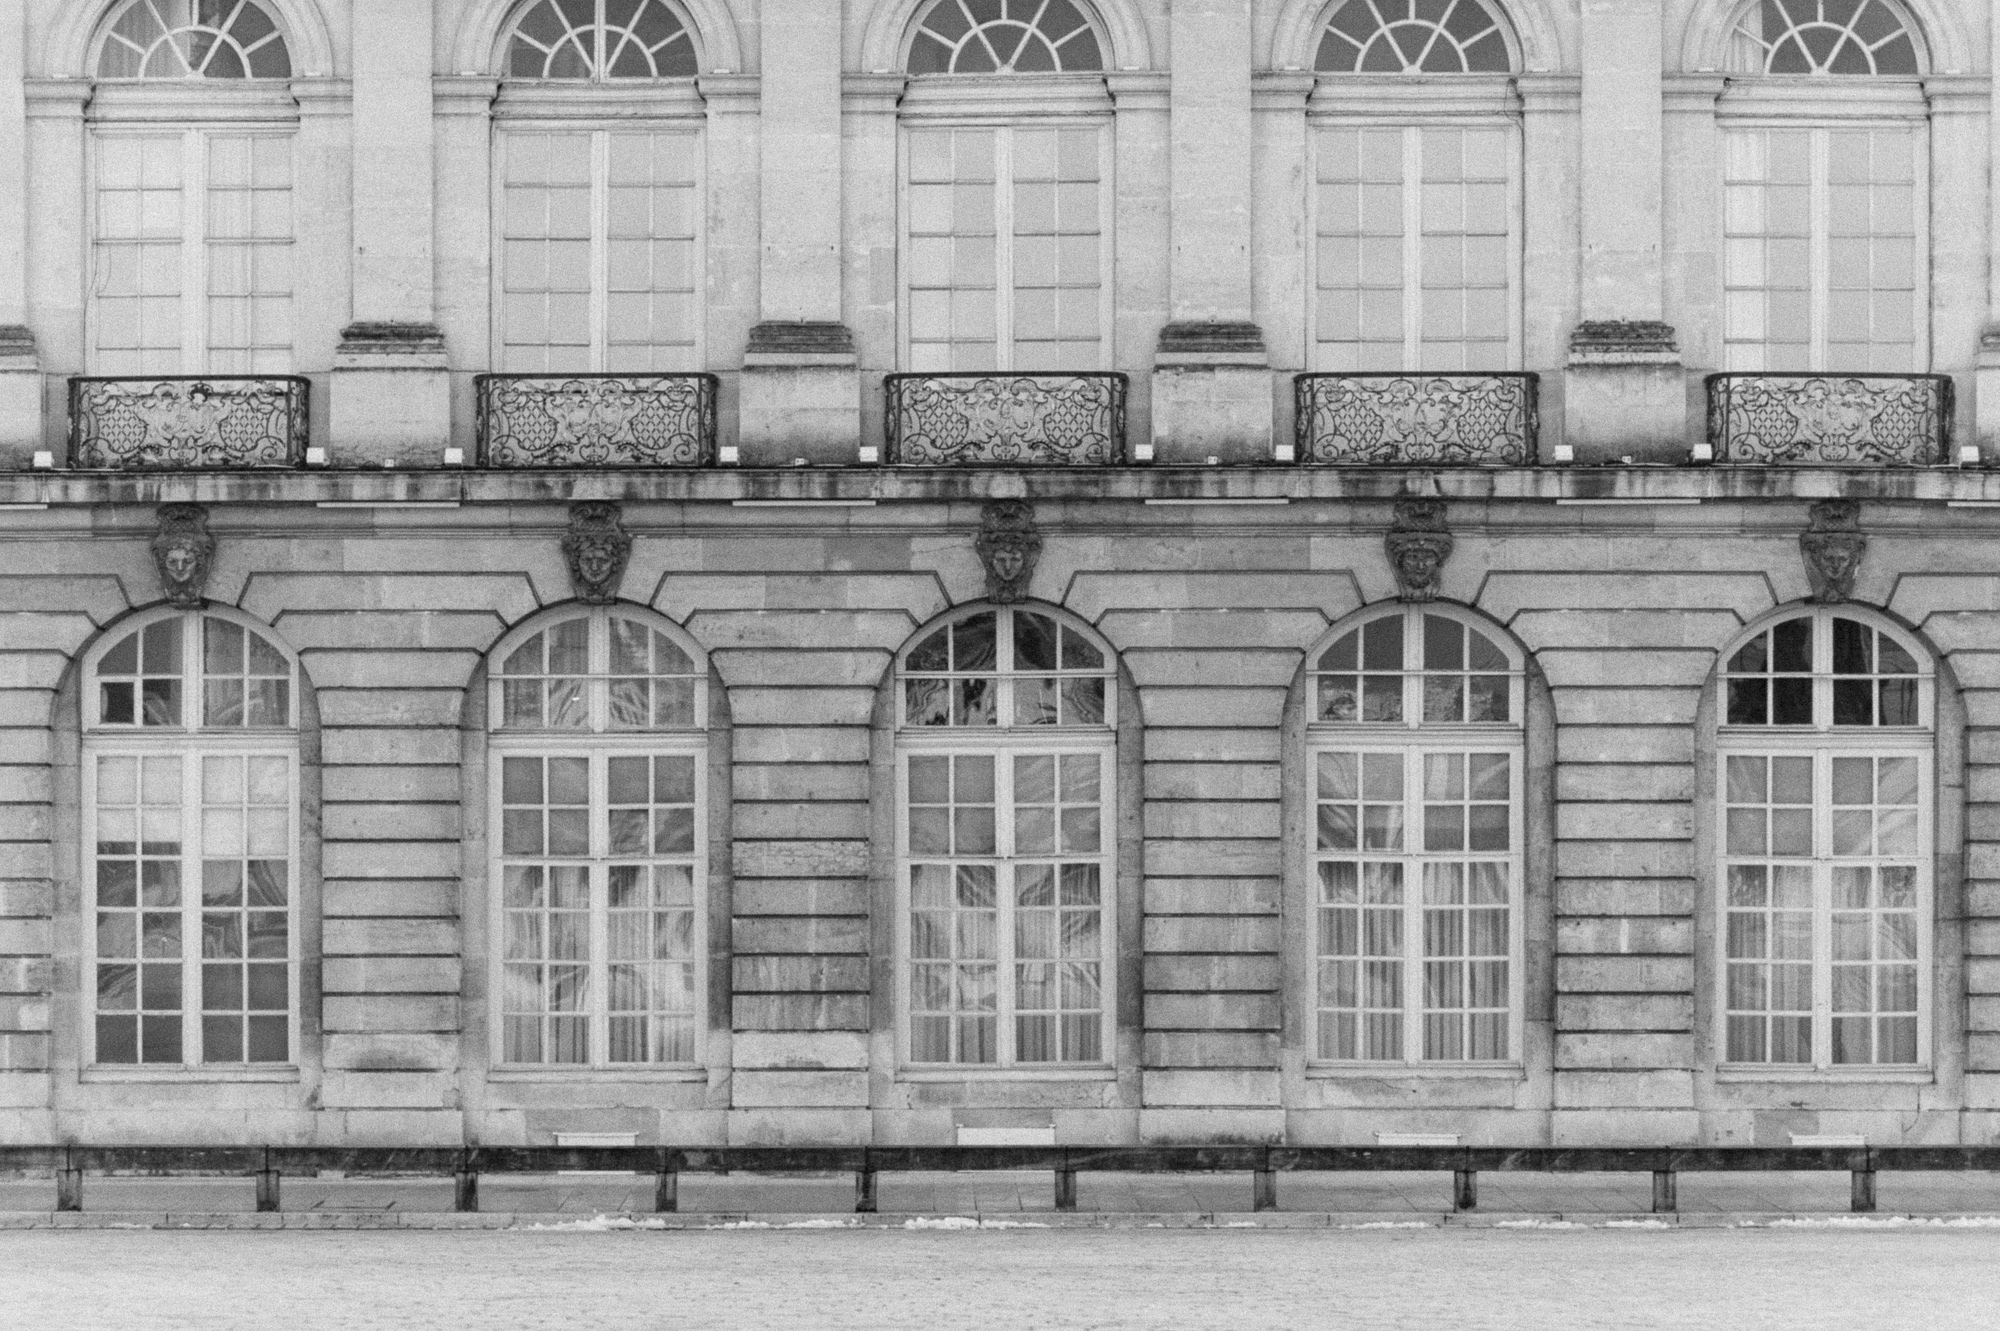 Nancy_France_2019_14.jpg